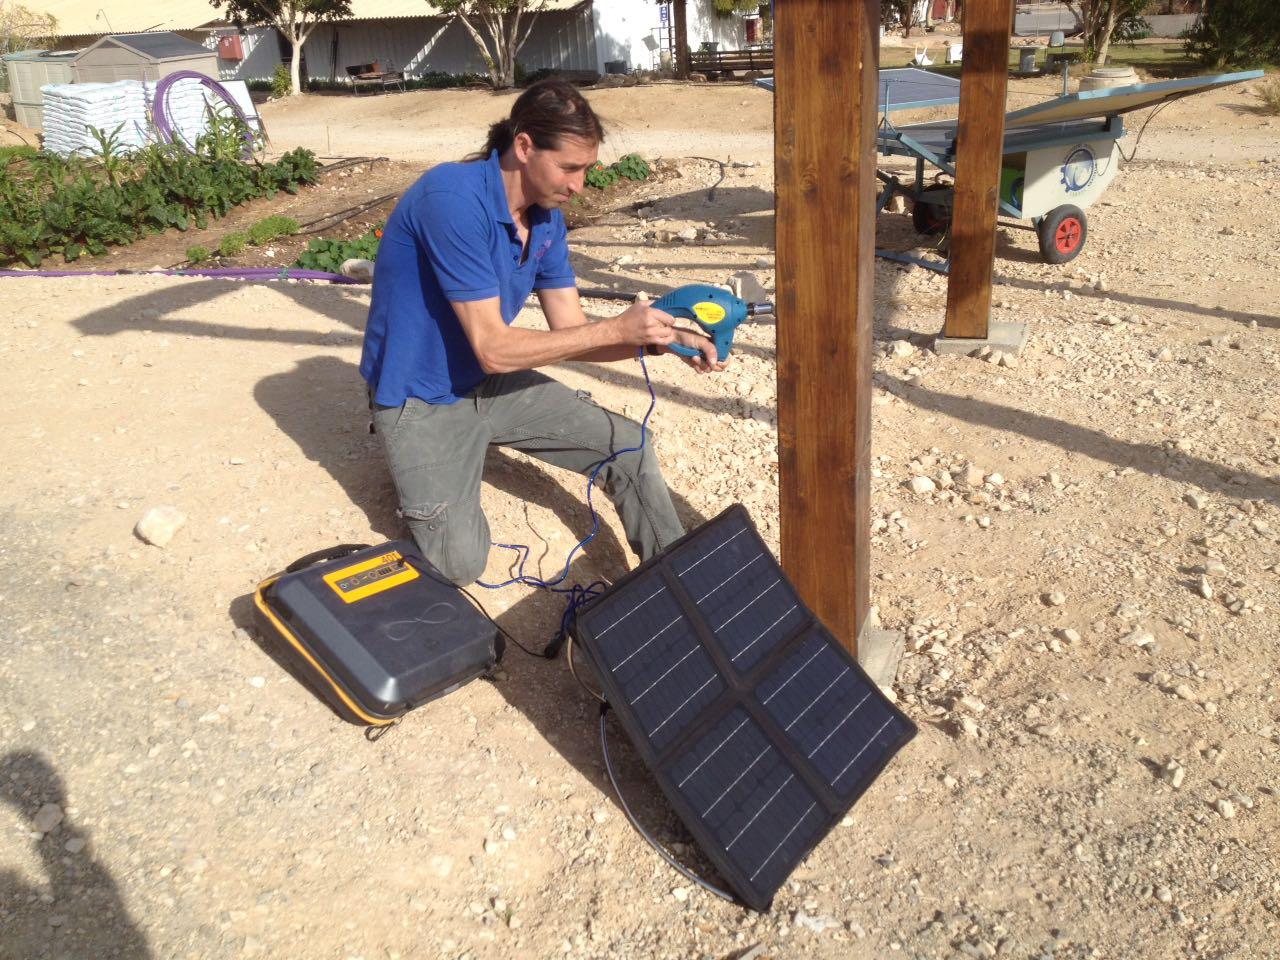 KALIPACK solar suitcase